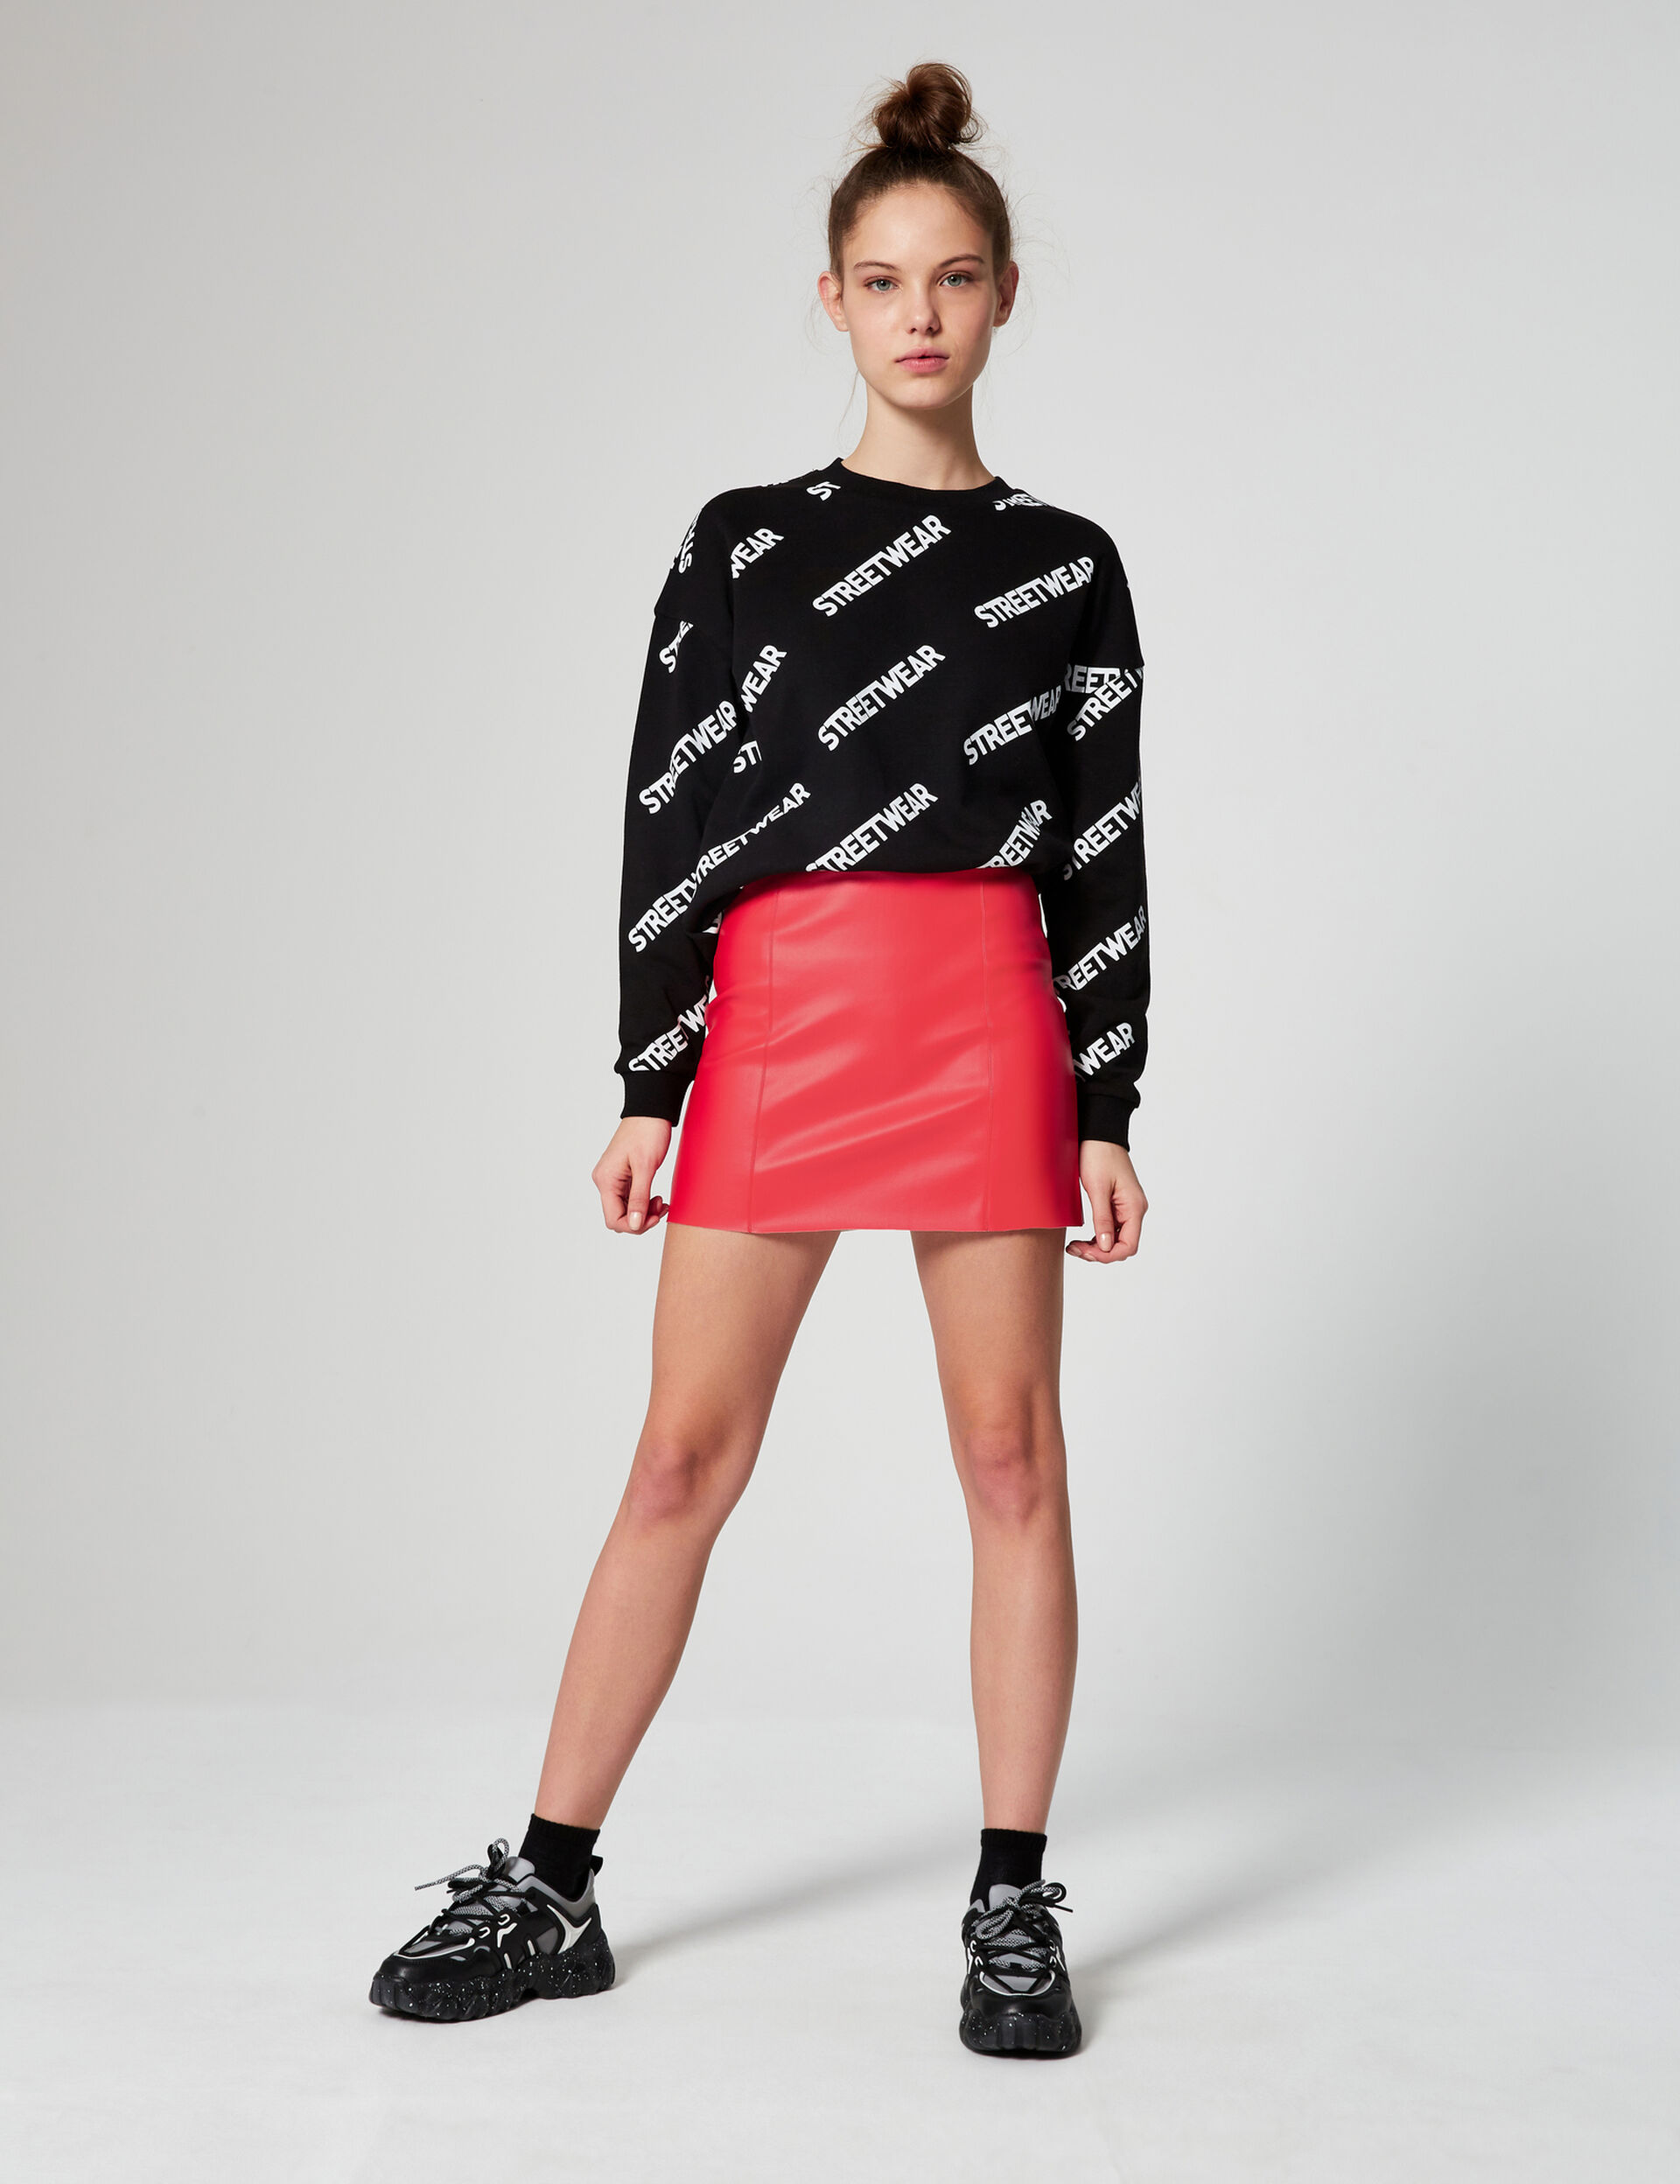 Imitation-leather miniskirt